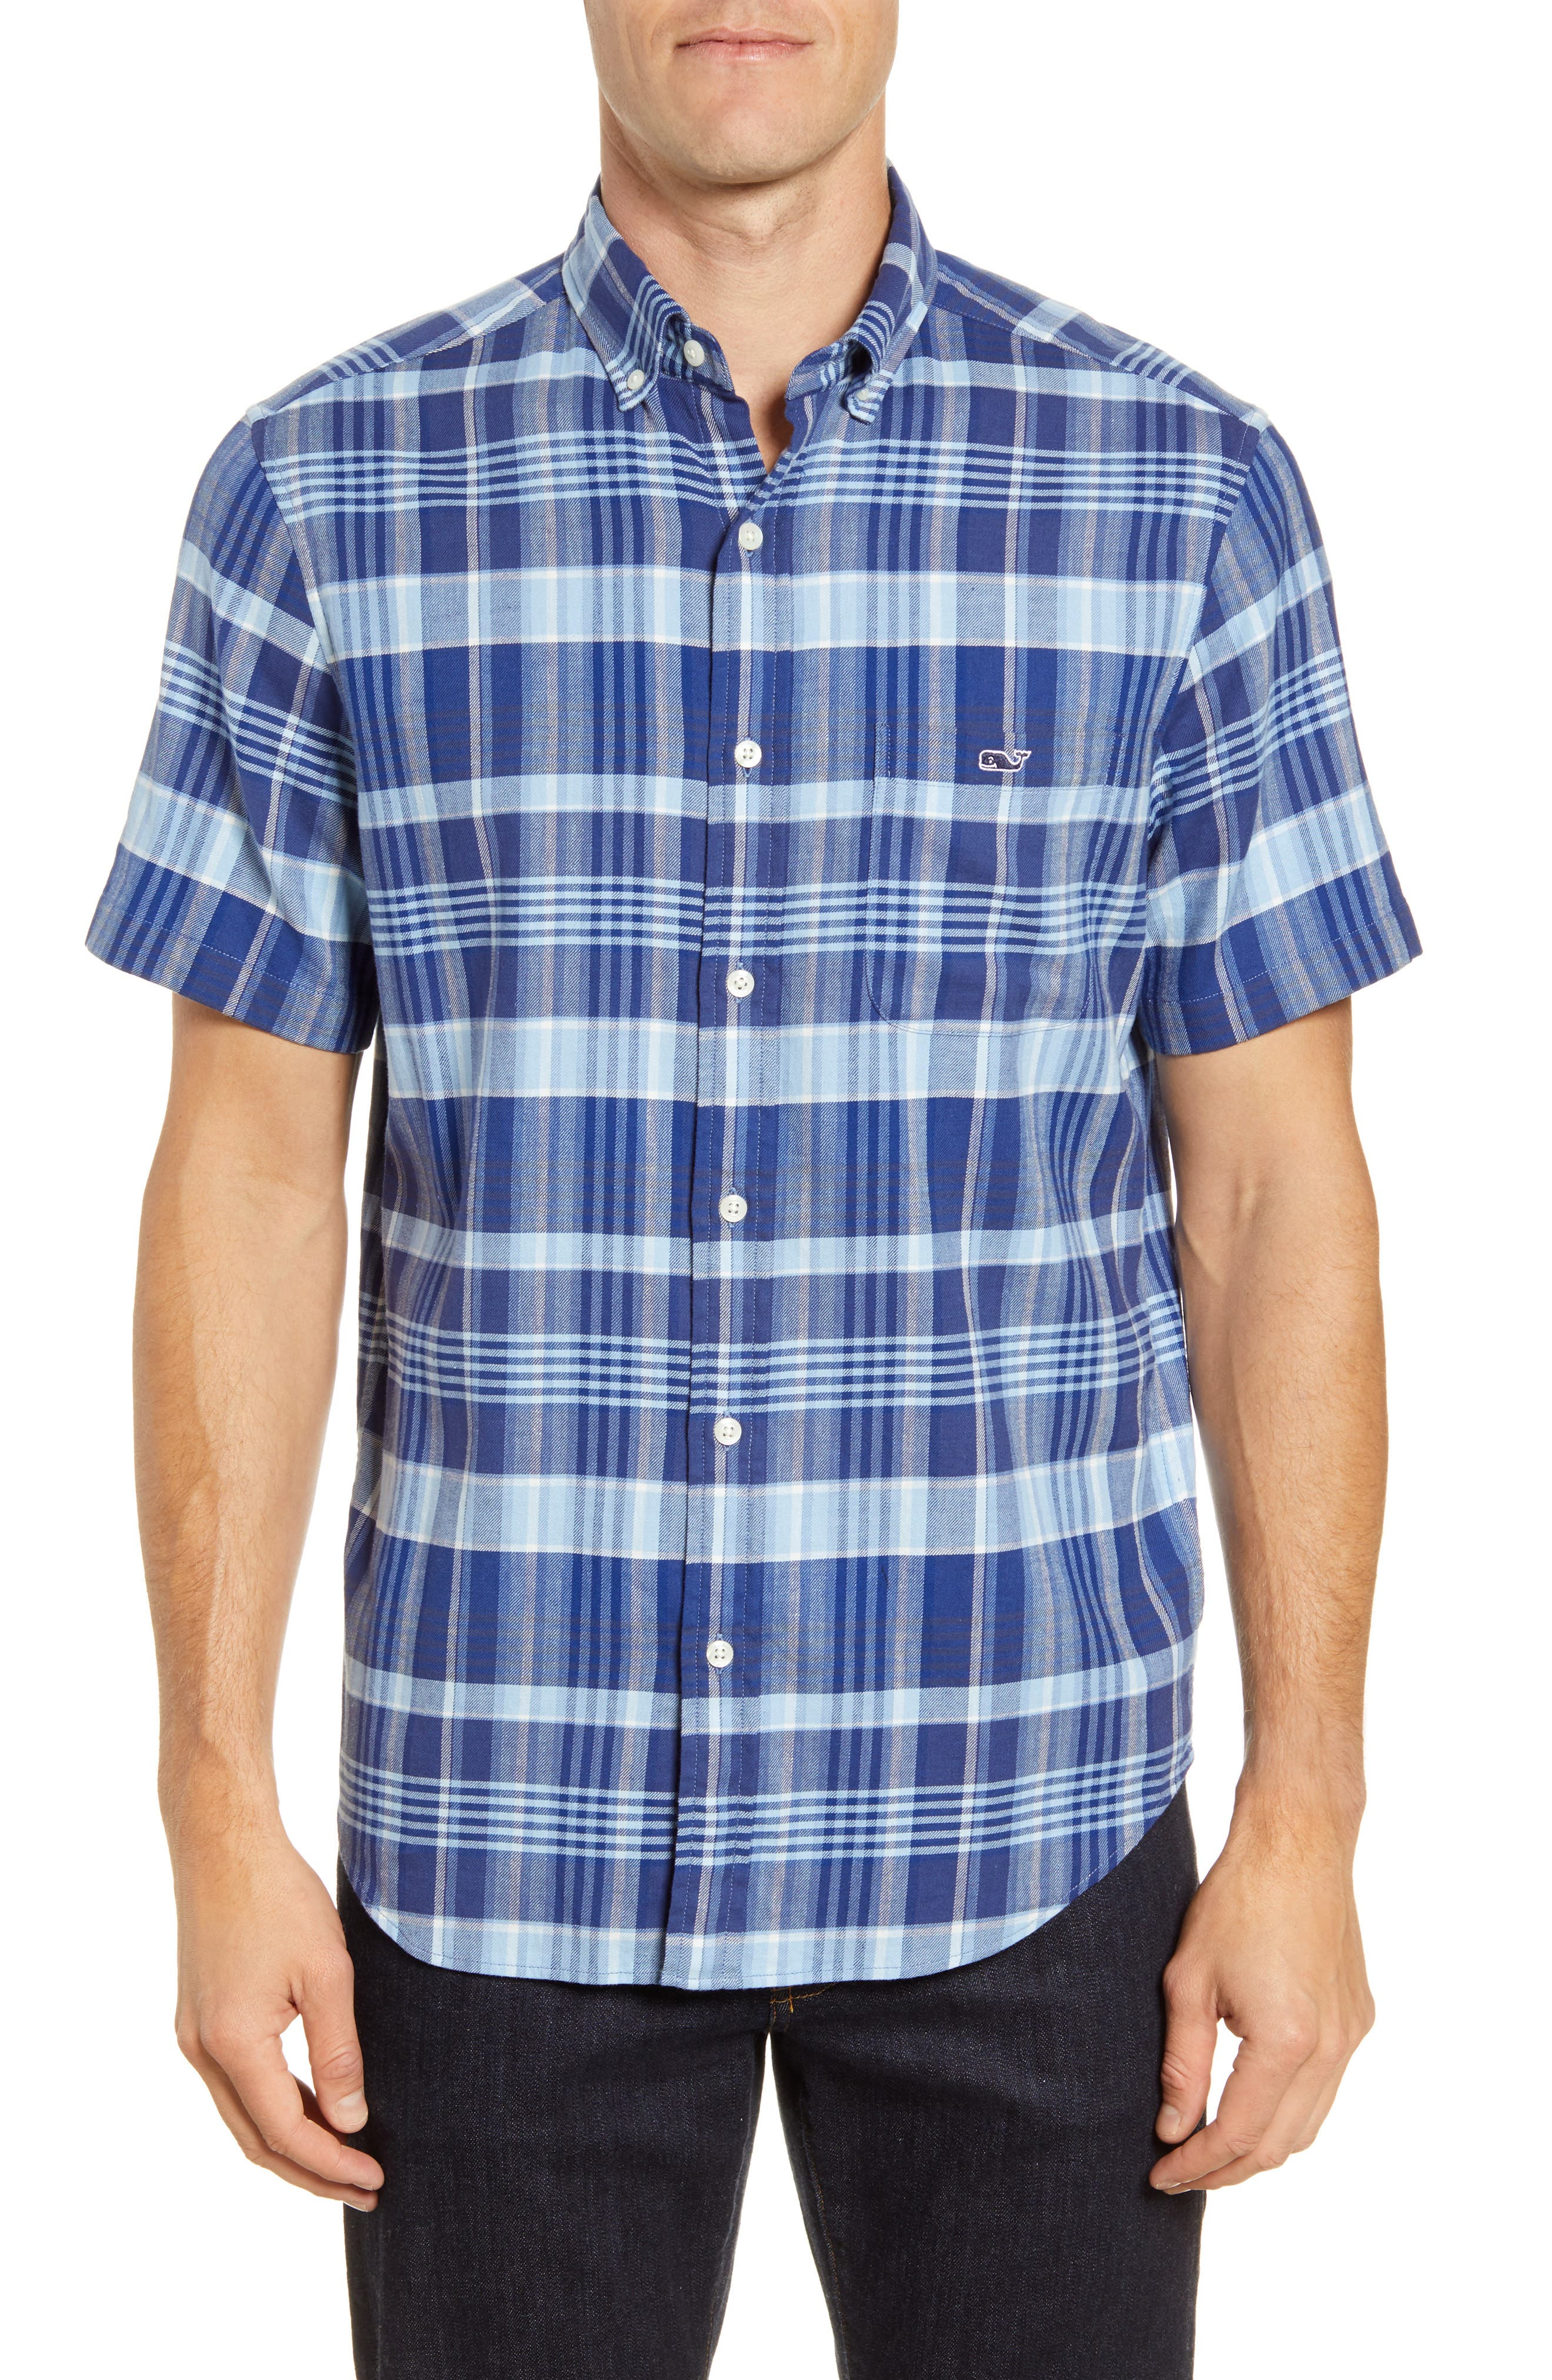 Image of Vineyard Vines Tucker Classic Fit Plaid Short Sleeve Button-Down Shirt